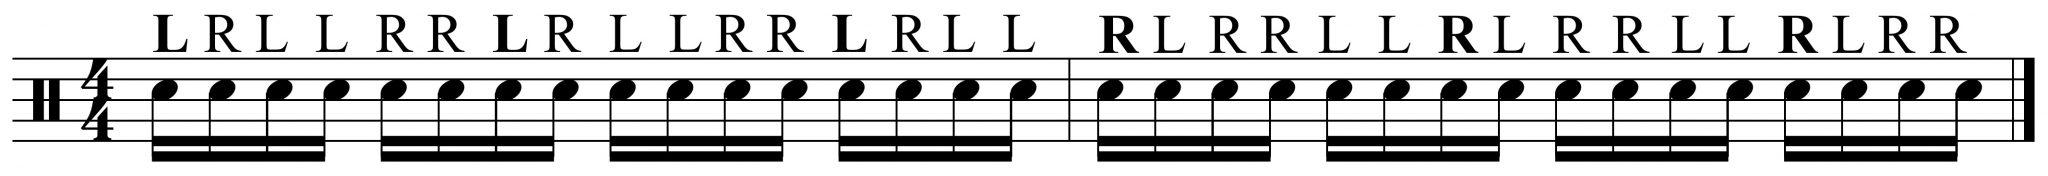 2 bar paradiddle diddle pattern